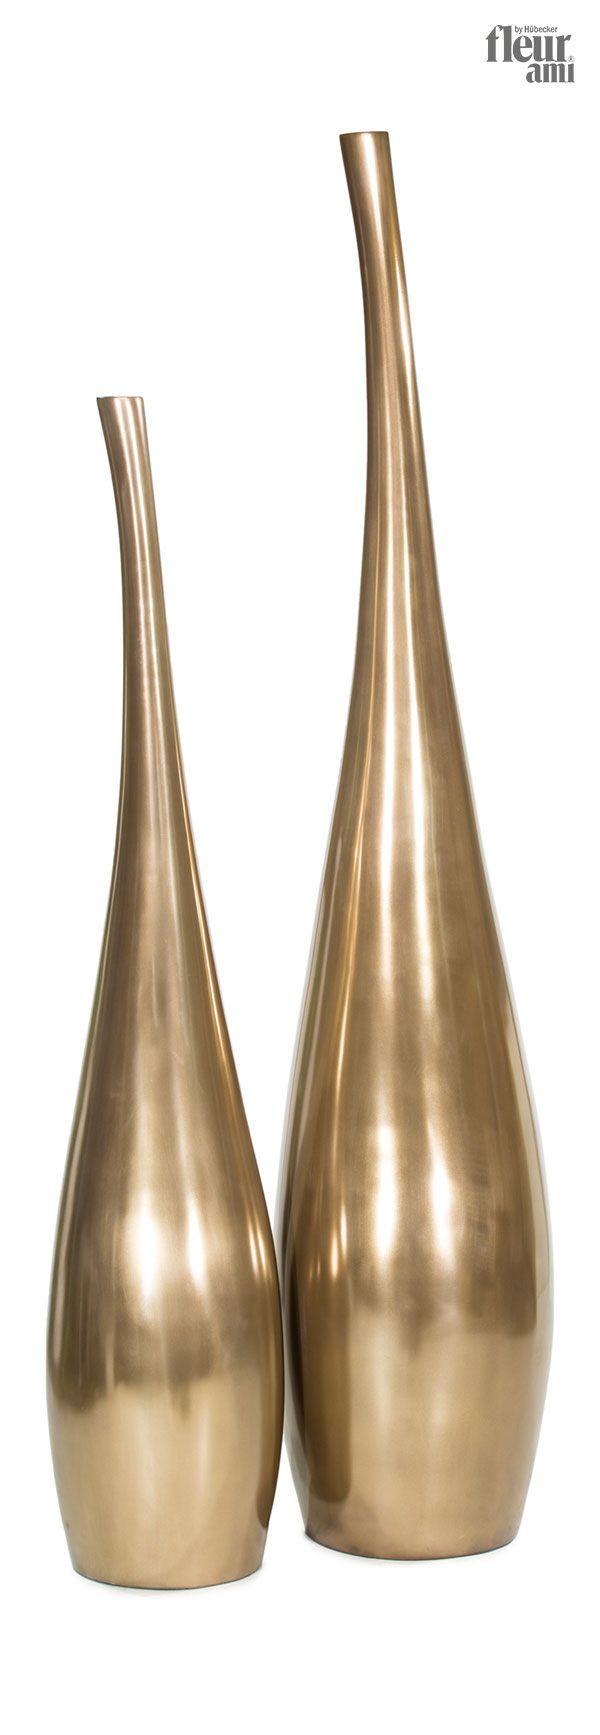 Best 25 floor vases ideas on pinterest decorating vases floor glory floor vases by fleur ami elegant coloring impressive sizes glory bodenvasen von reviewsmspy